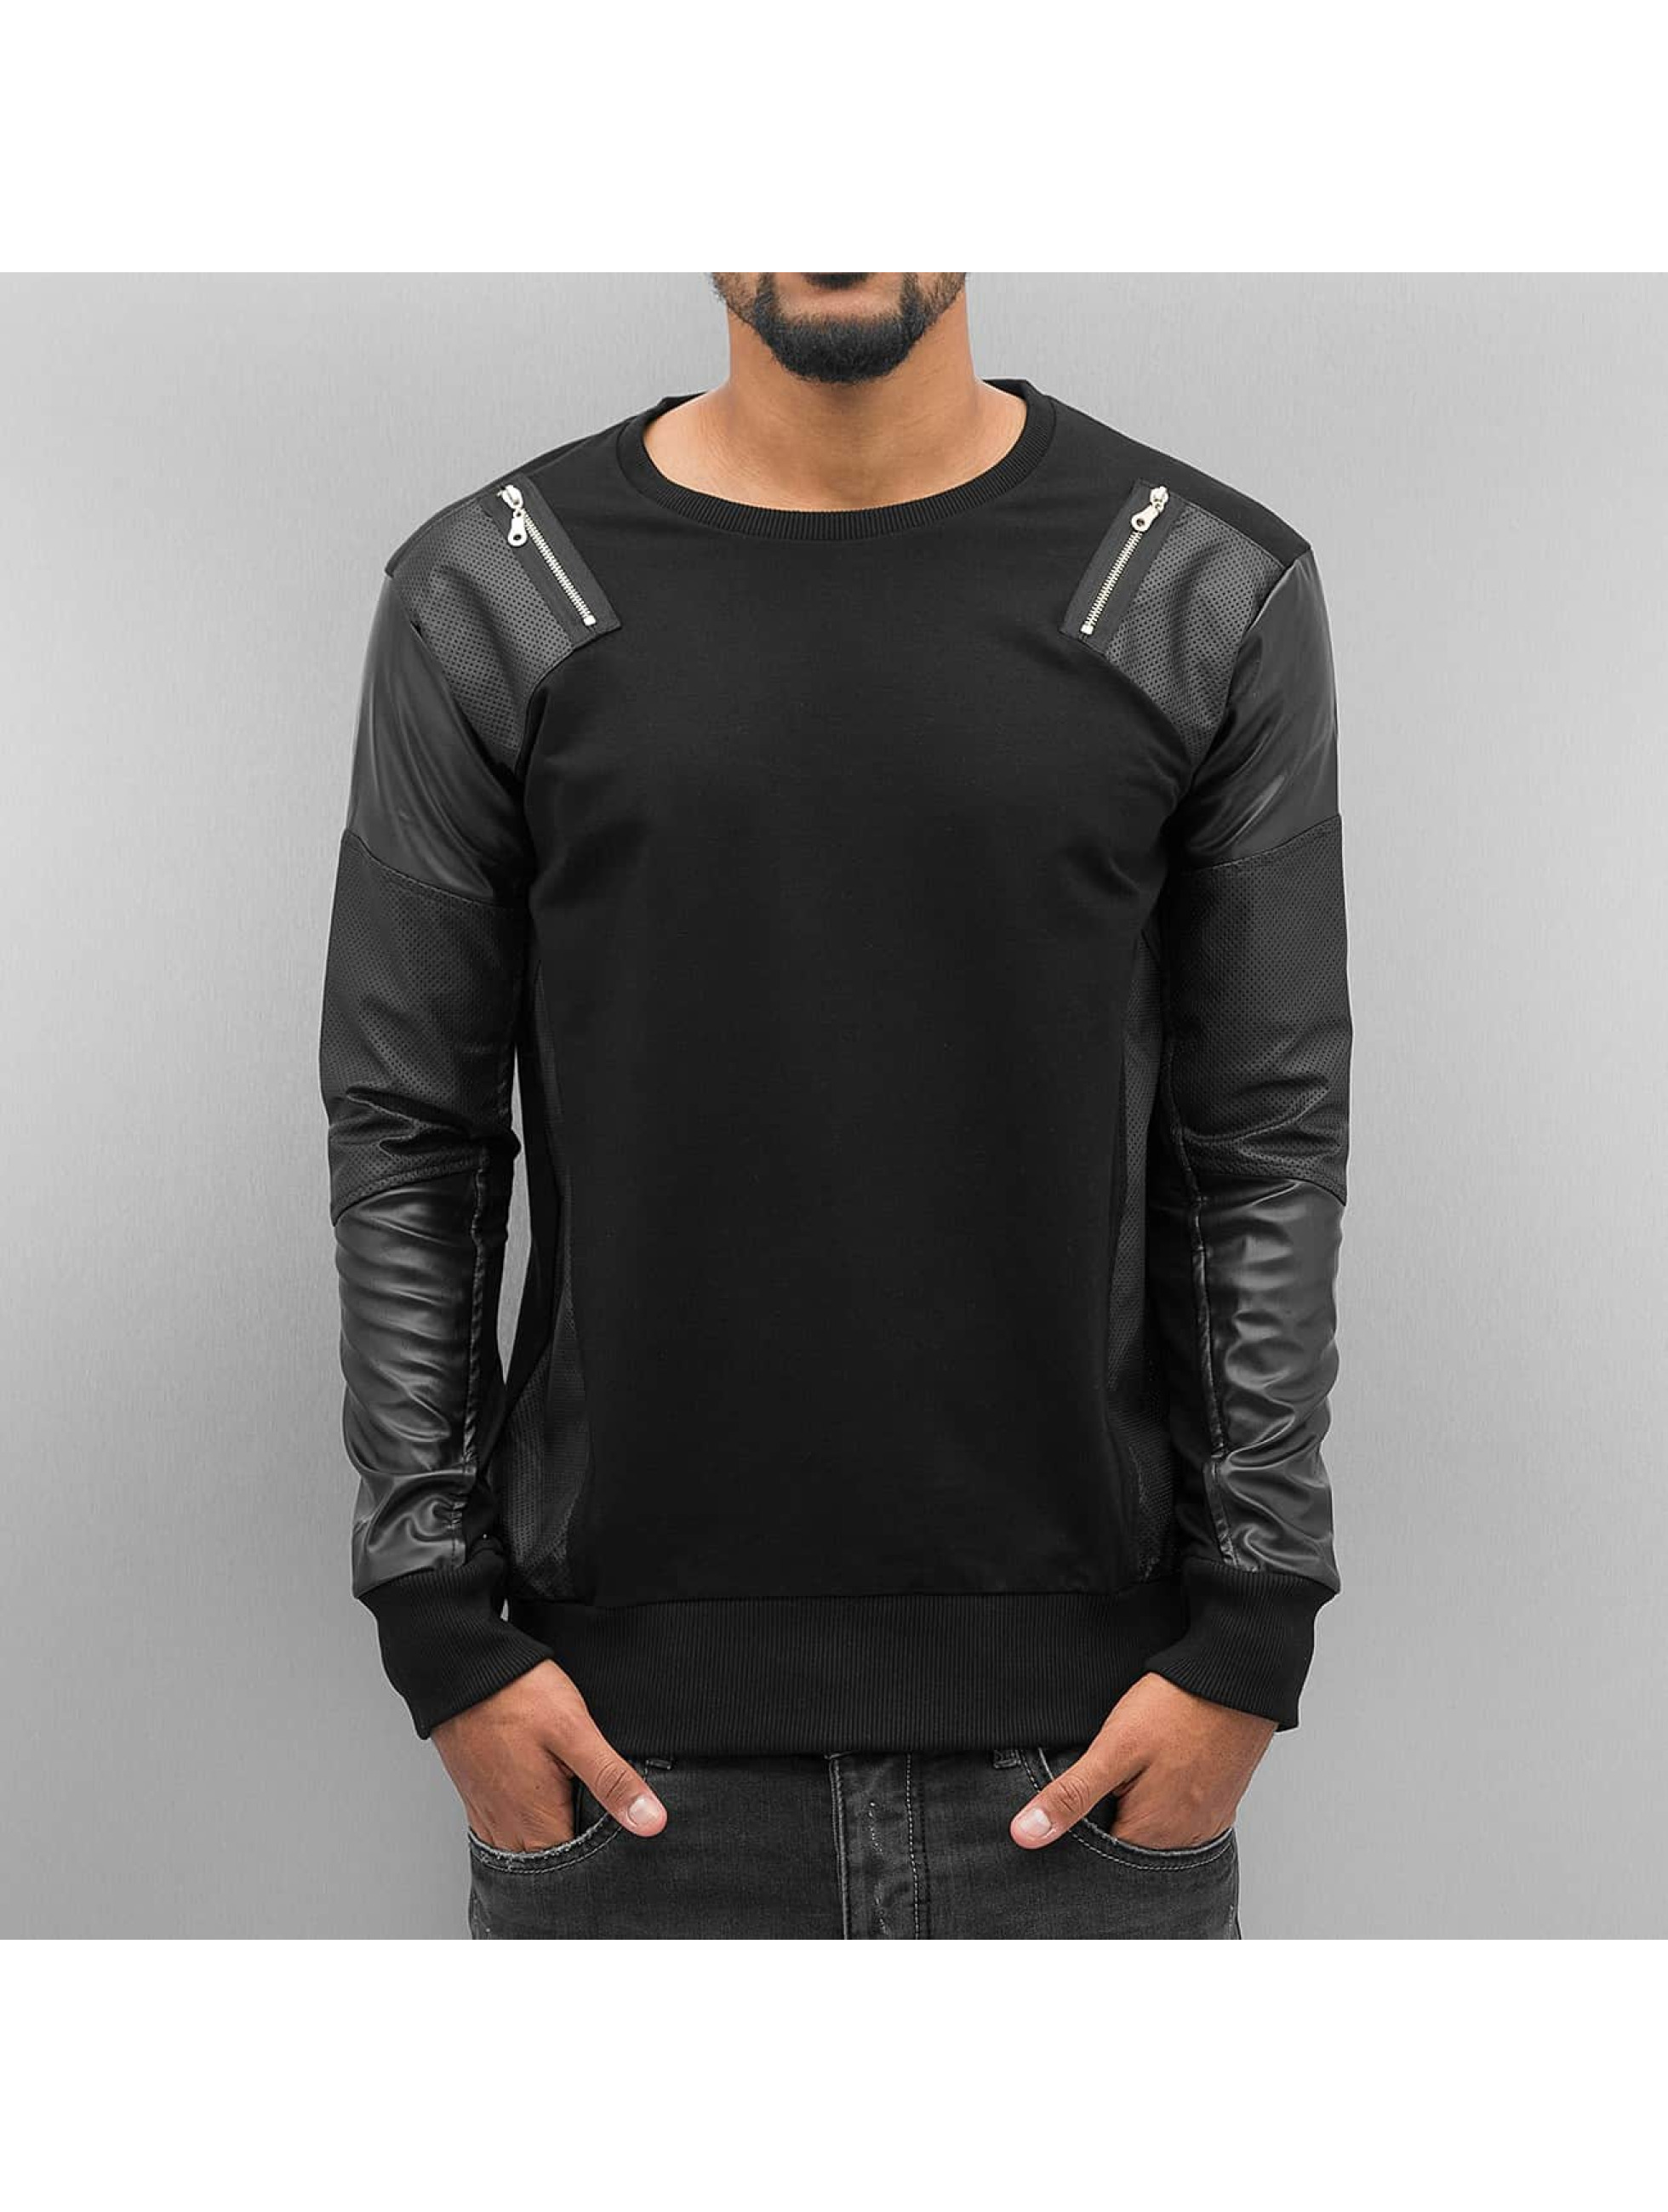 Cipo & Baxx Pullover Fake Leather black